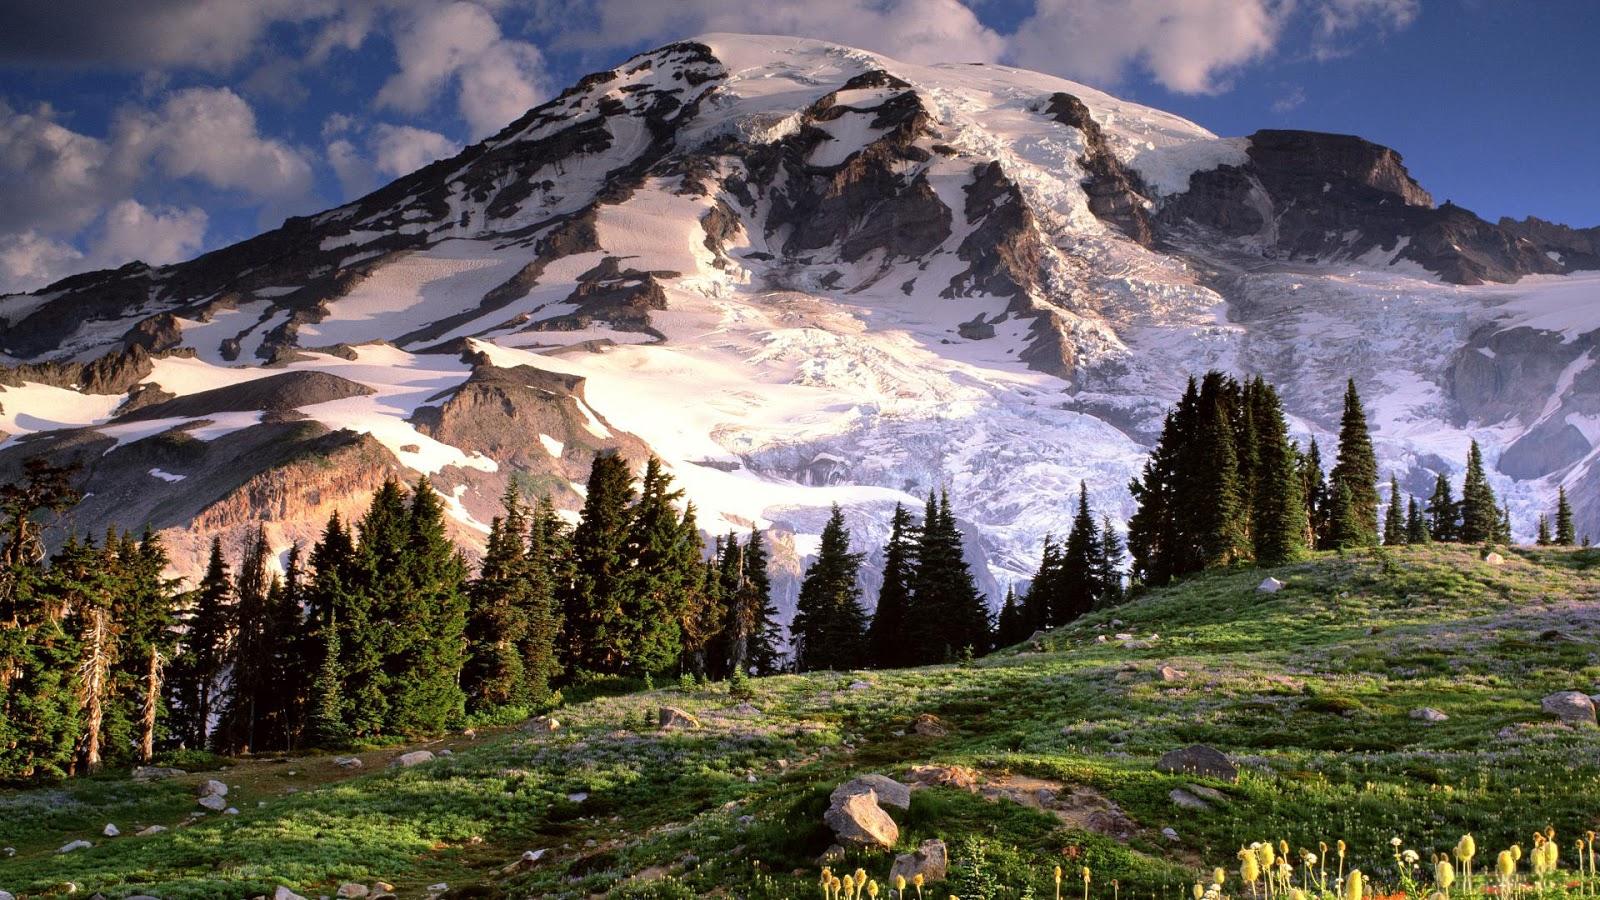 Gunung Rainier, Mount Rainier, wallpaper desktop, wallpapers hd, wallpaper love, wallpapers for android, wallpaper 3d, wallpaper nature, wallpaper for mobile, wallpaper photo